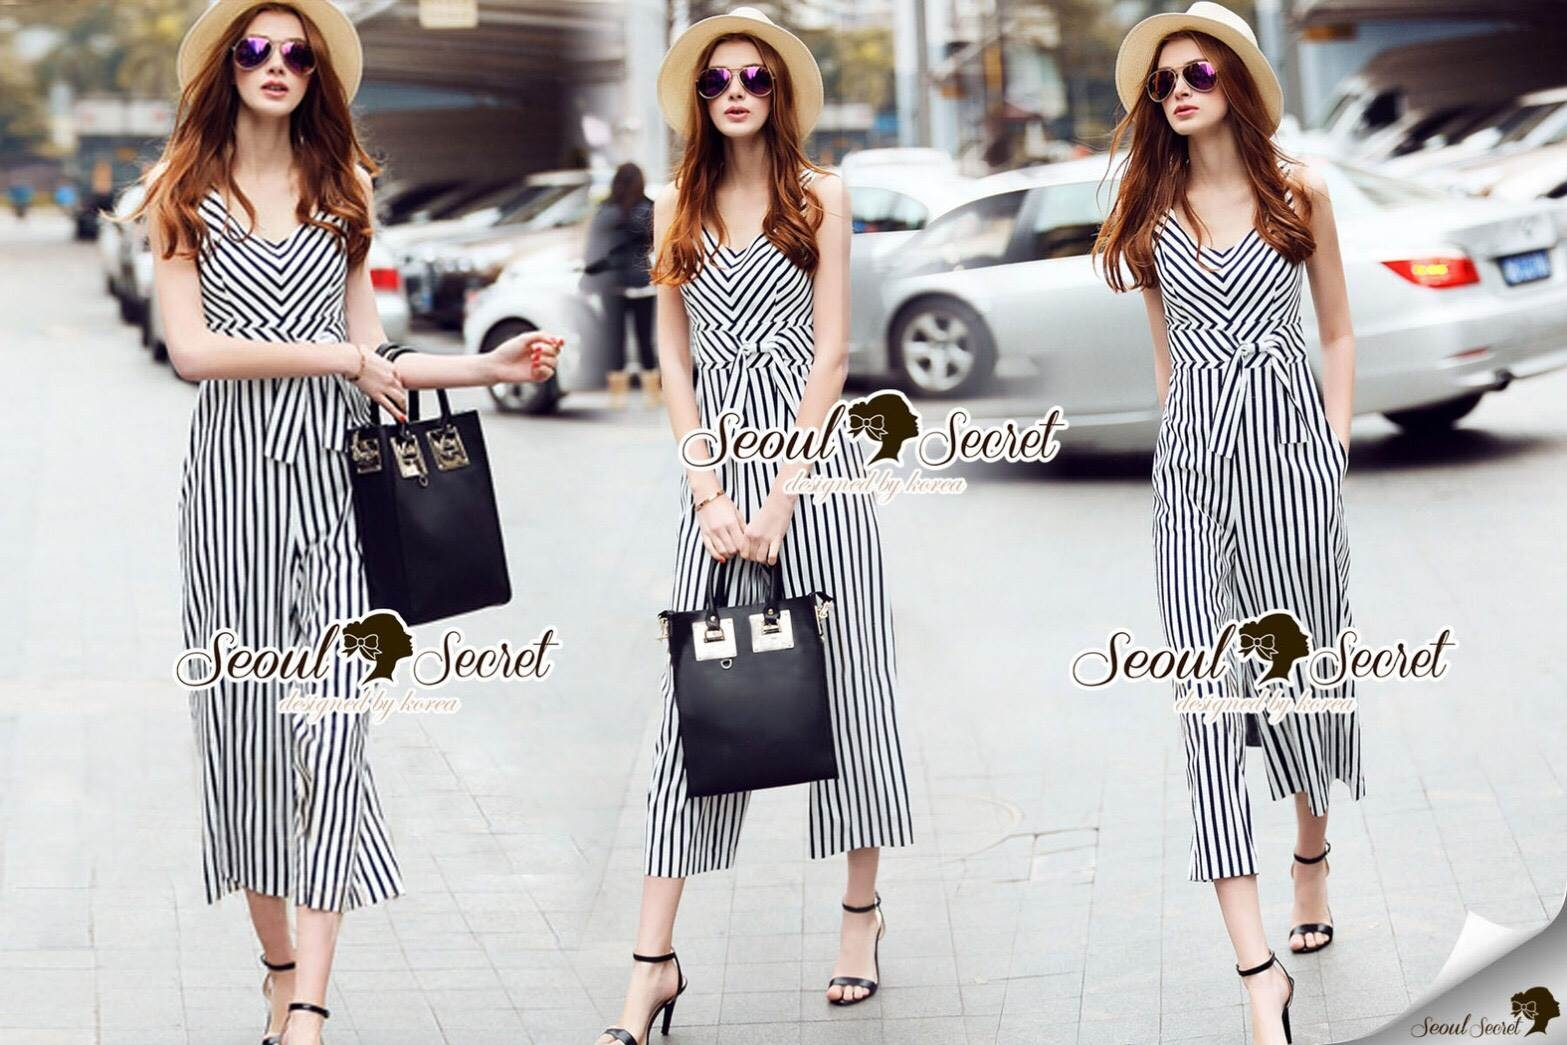 Seoul Secret Say's... Nifty Stripy Bowwy Waist Playsuit